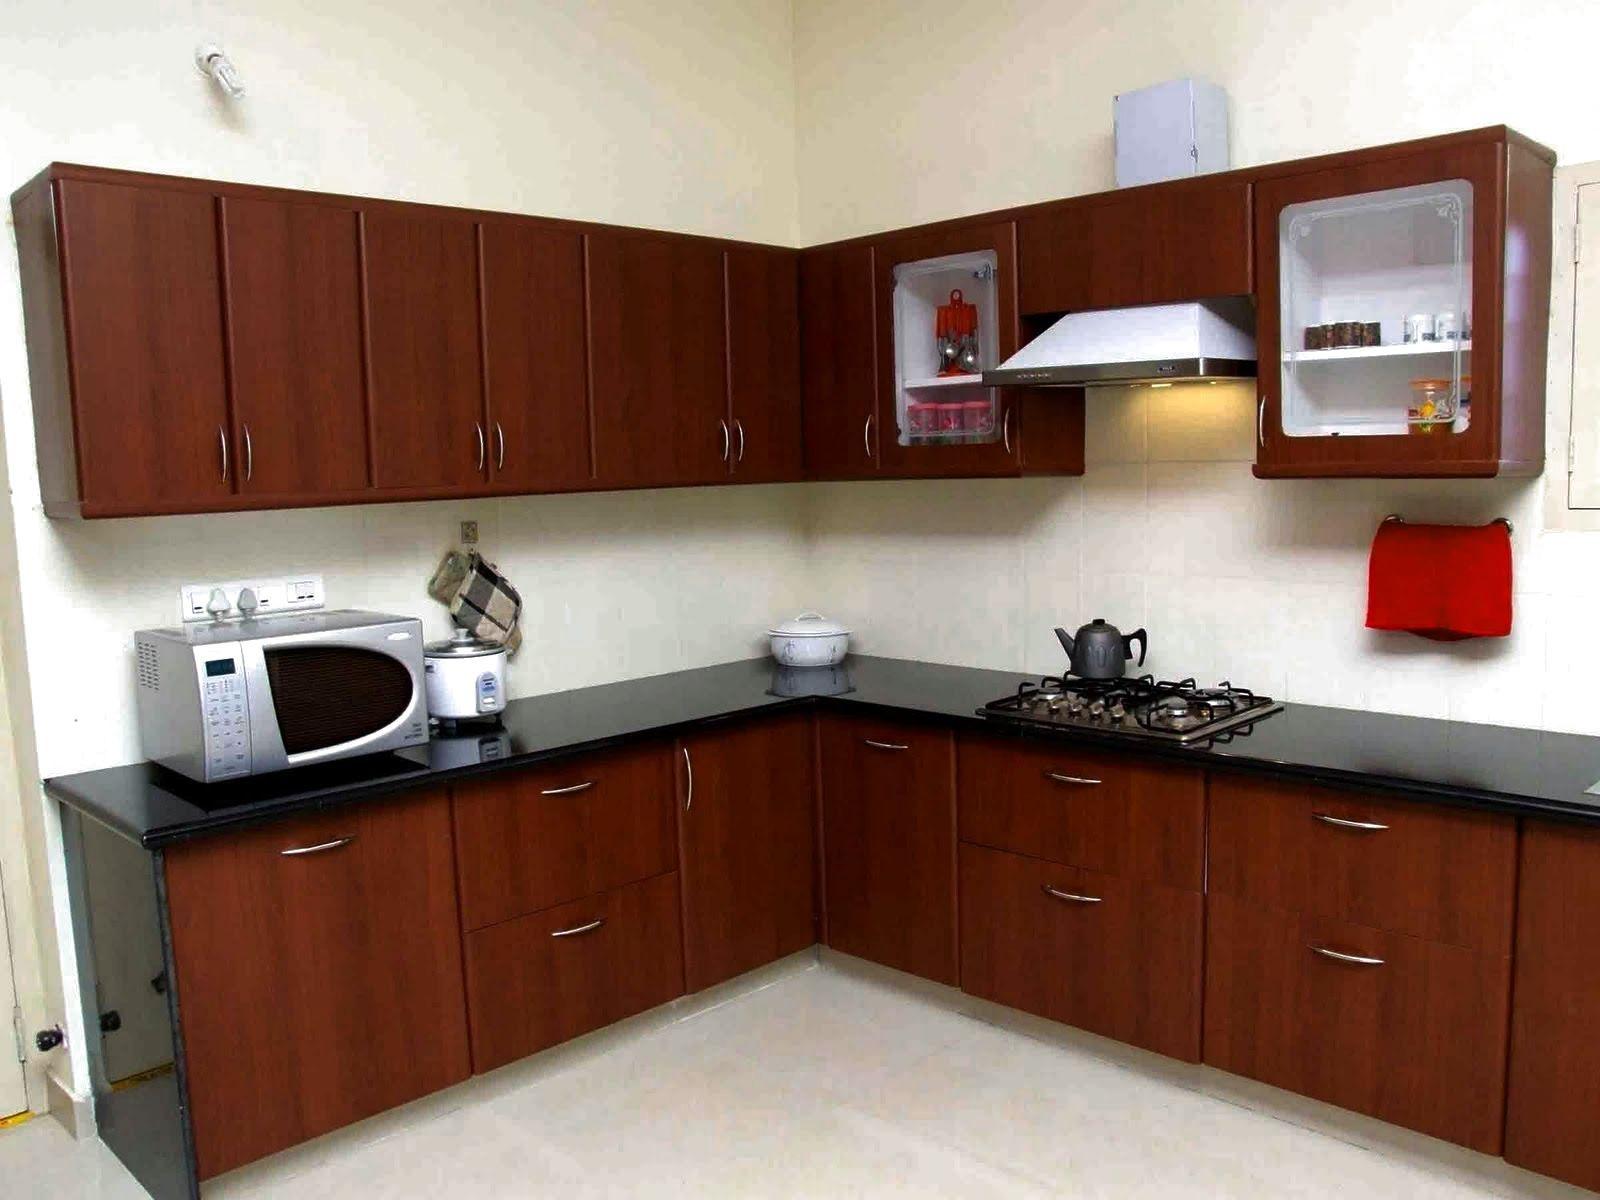 Design kitchen cabinets india ideas kitchen cabinet design indian home photos by design